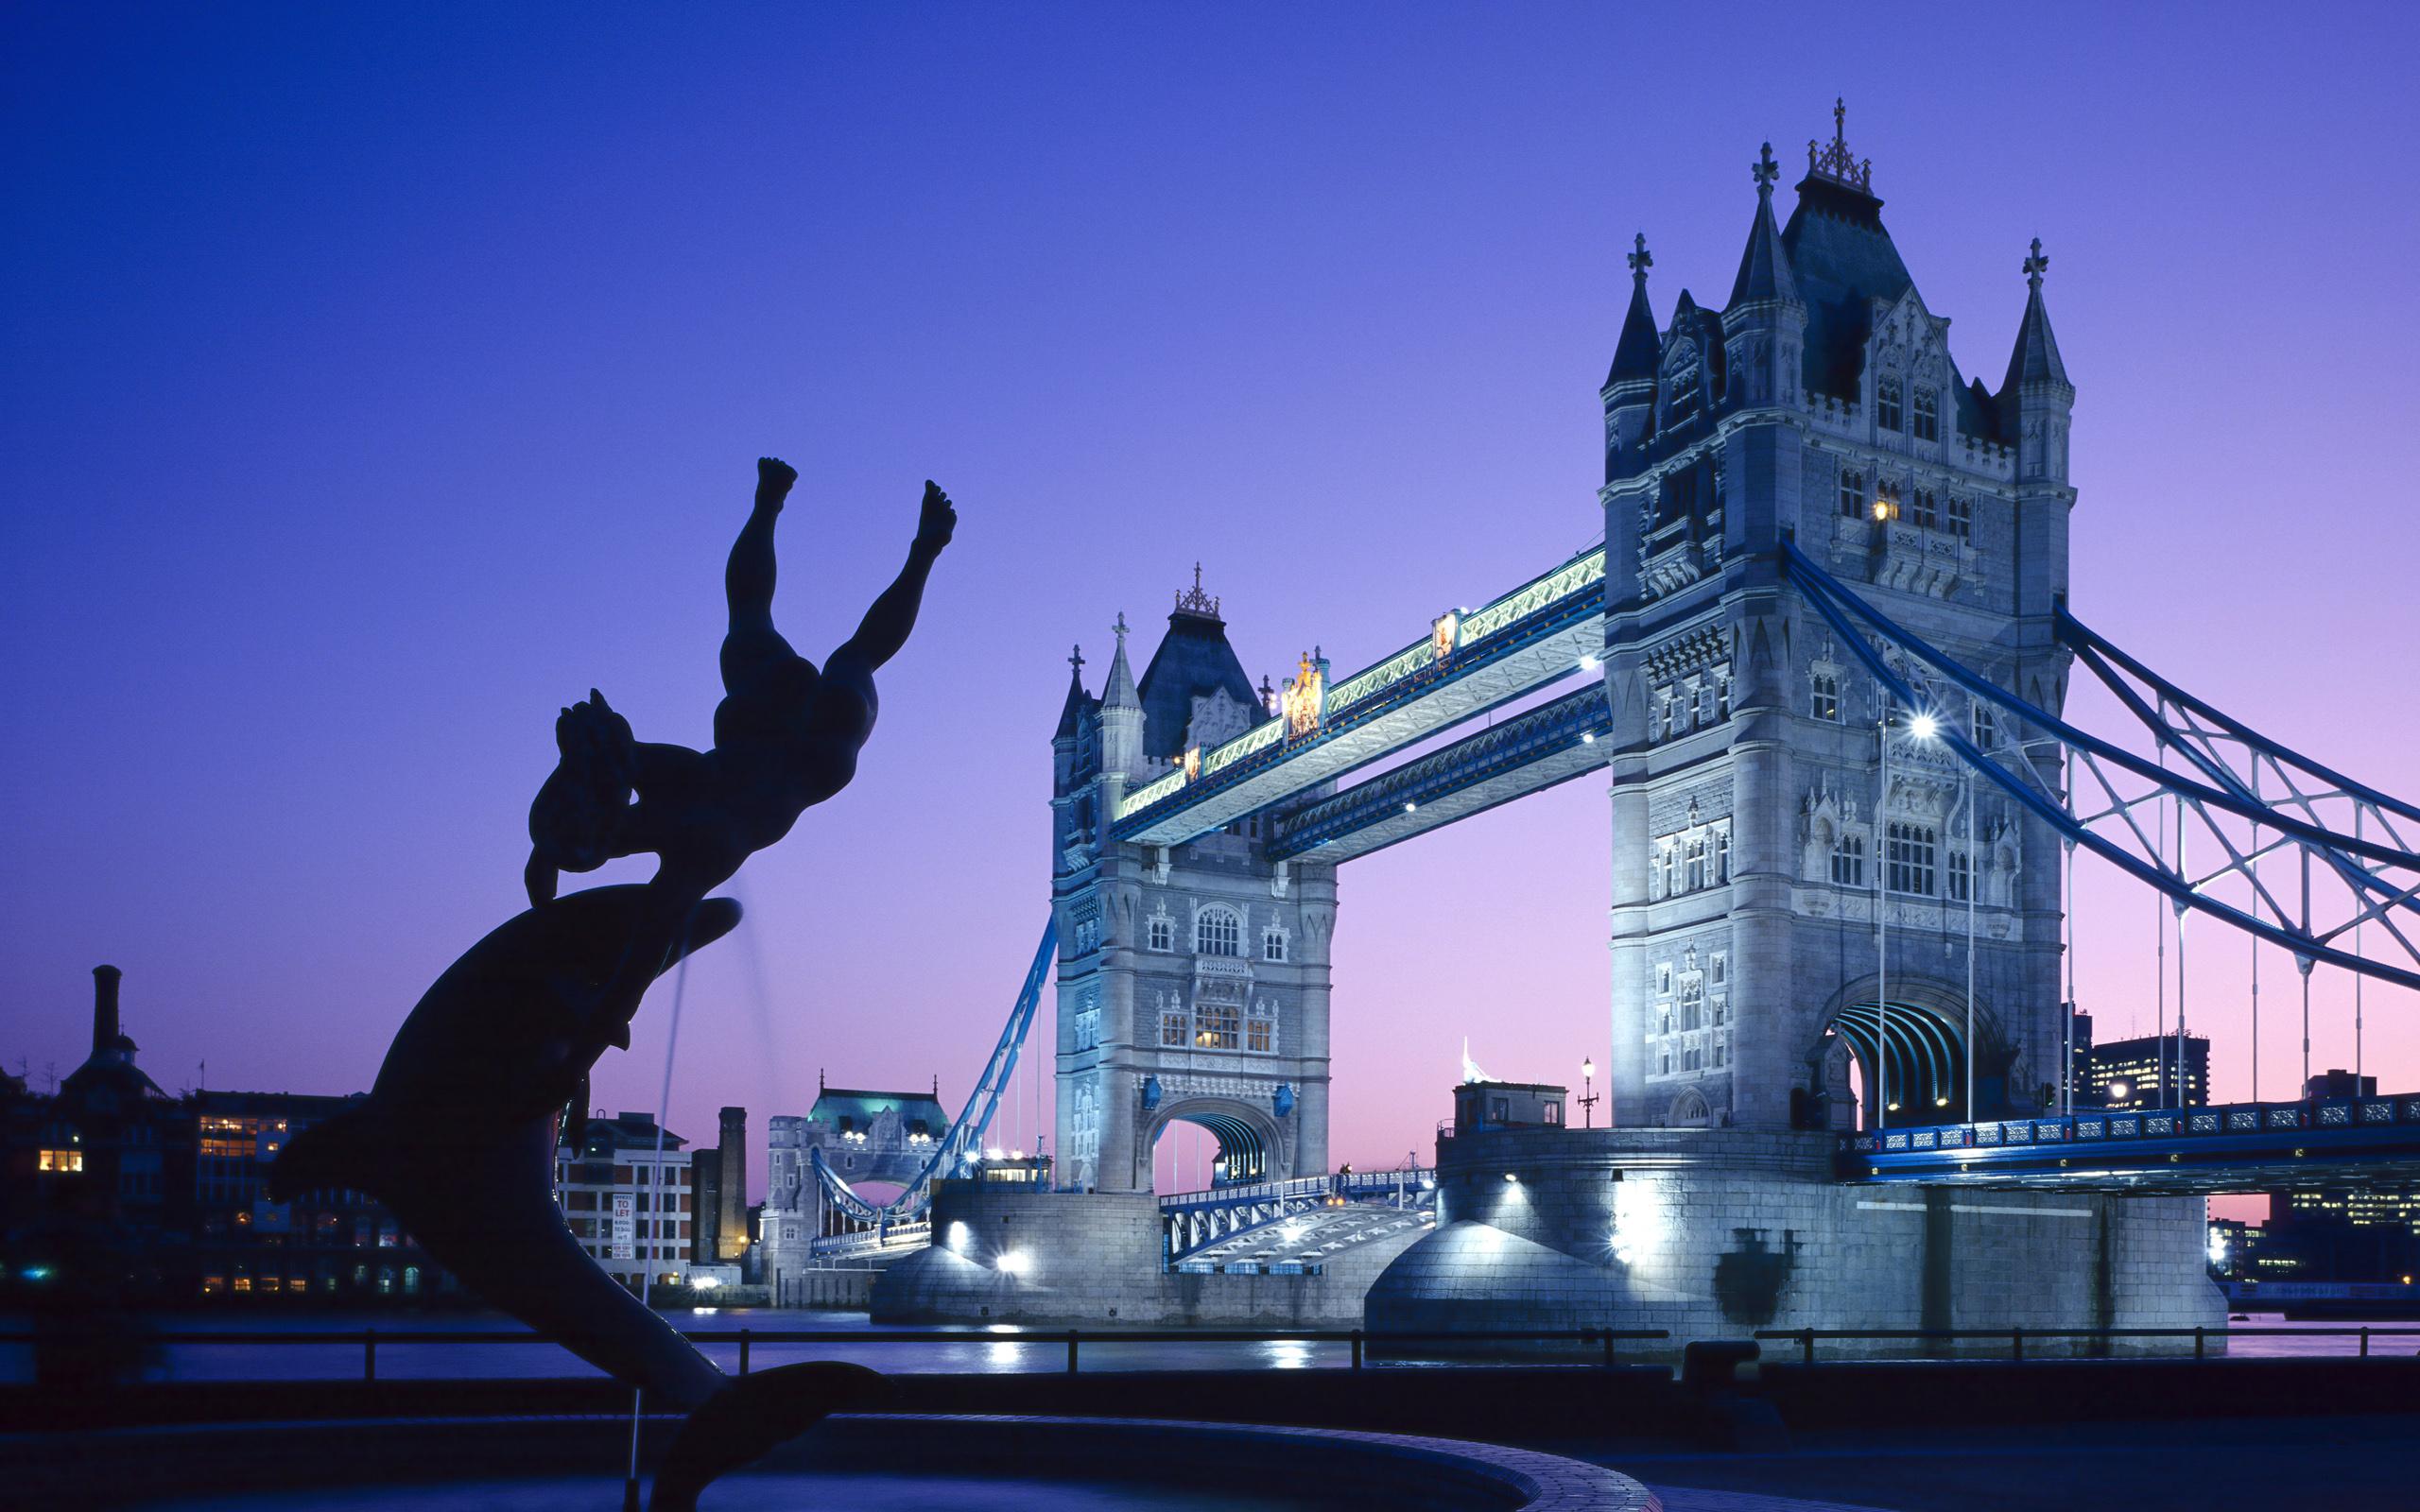 london wallpaper | london wallpaper hd | Free Hd london wallpapers ...